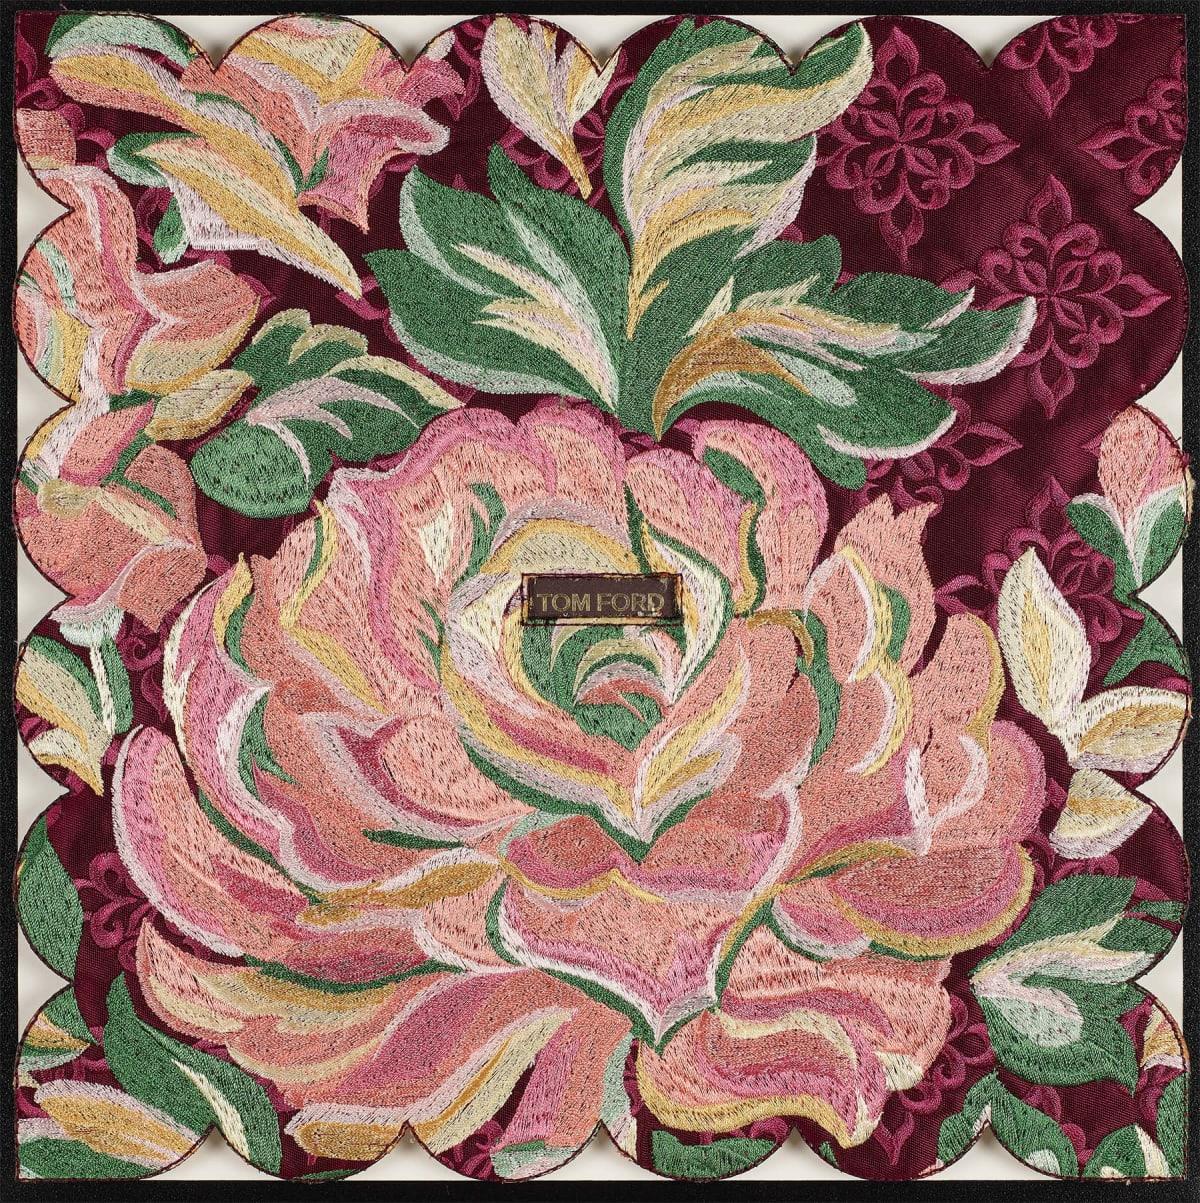 Stephen Wilson, T.F. Vintage Tapestry , 2019